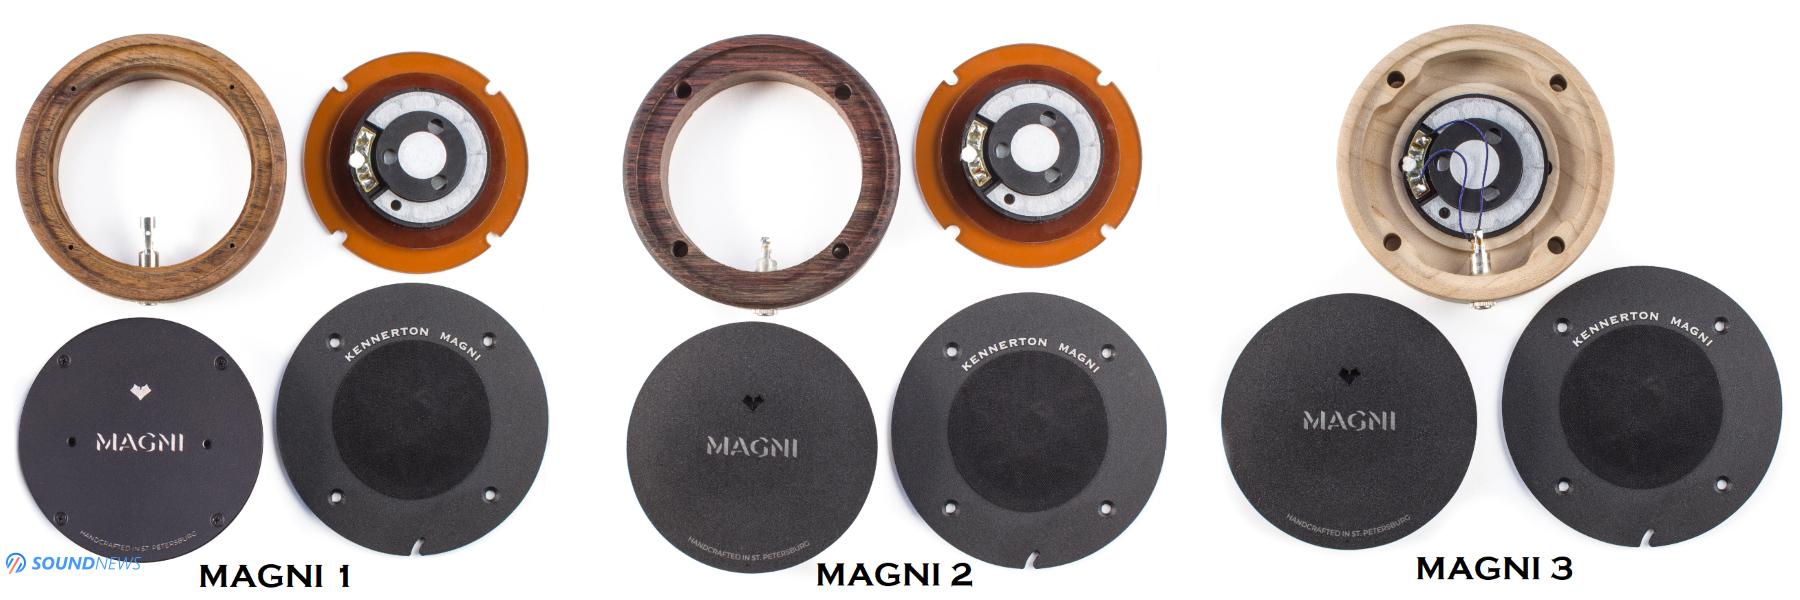 kennerton-magni-all-3-versions_small.jpg